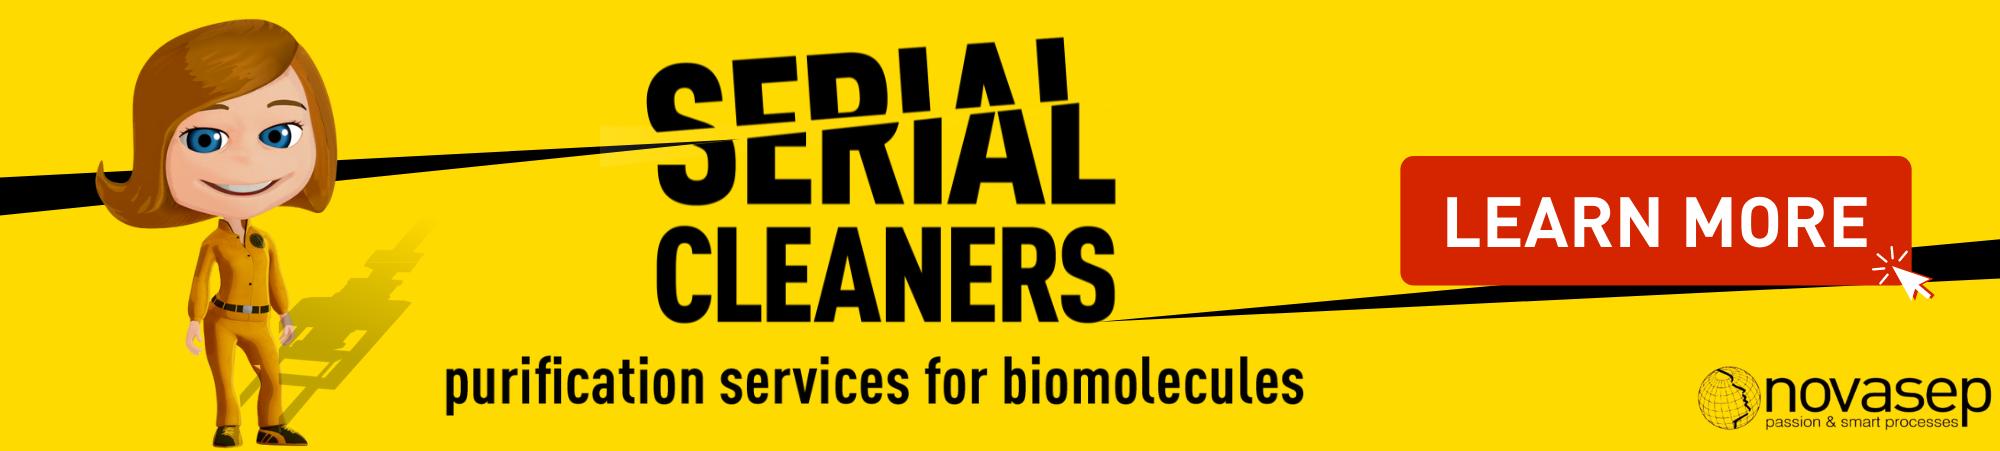 Novasep Serial Cleaners Banner